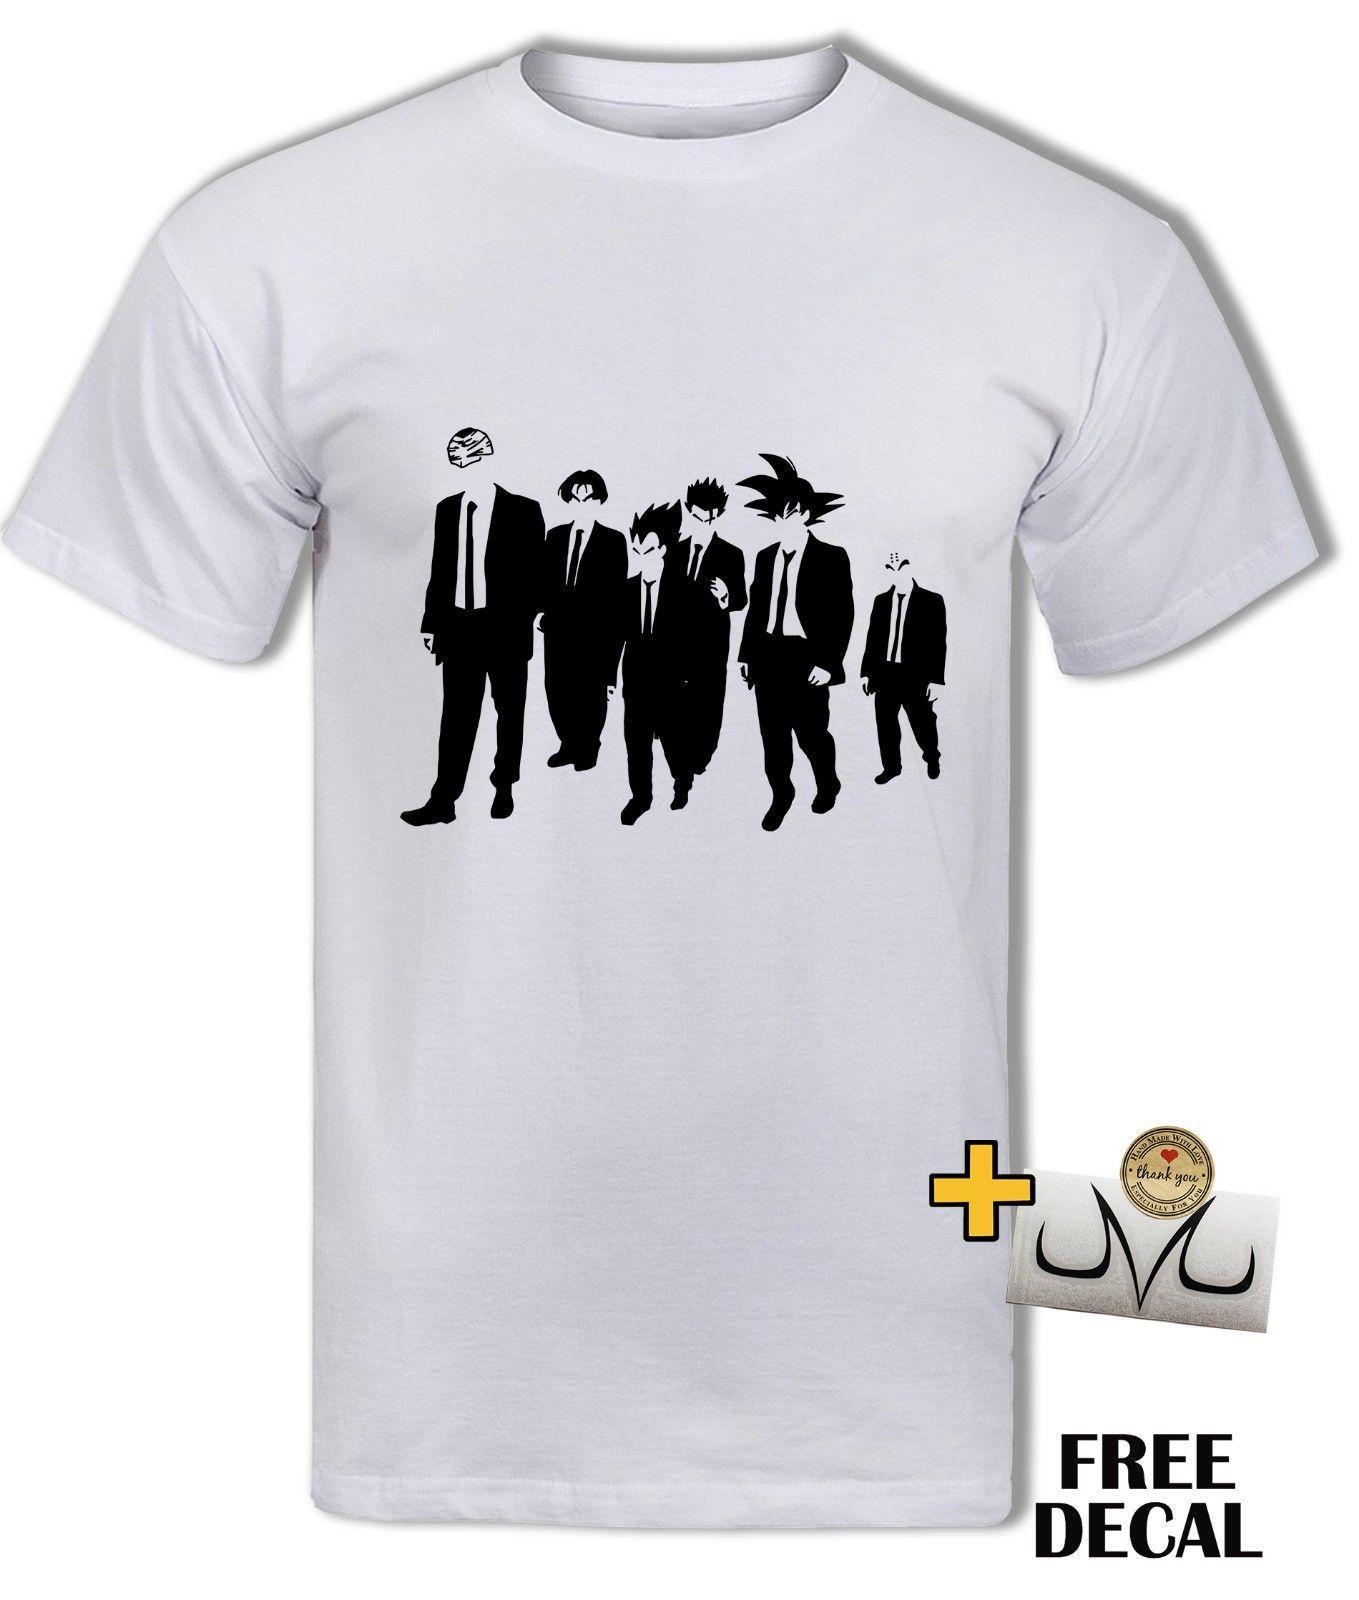 Compre Dragon Ball Z Camiseta 0e2472f19e5e